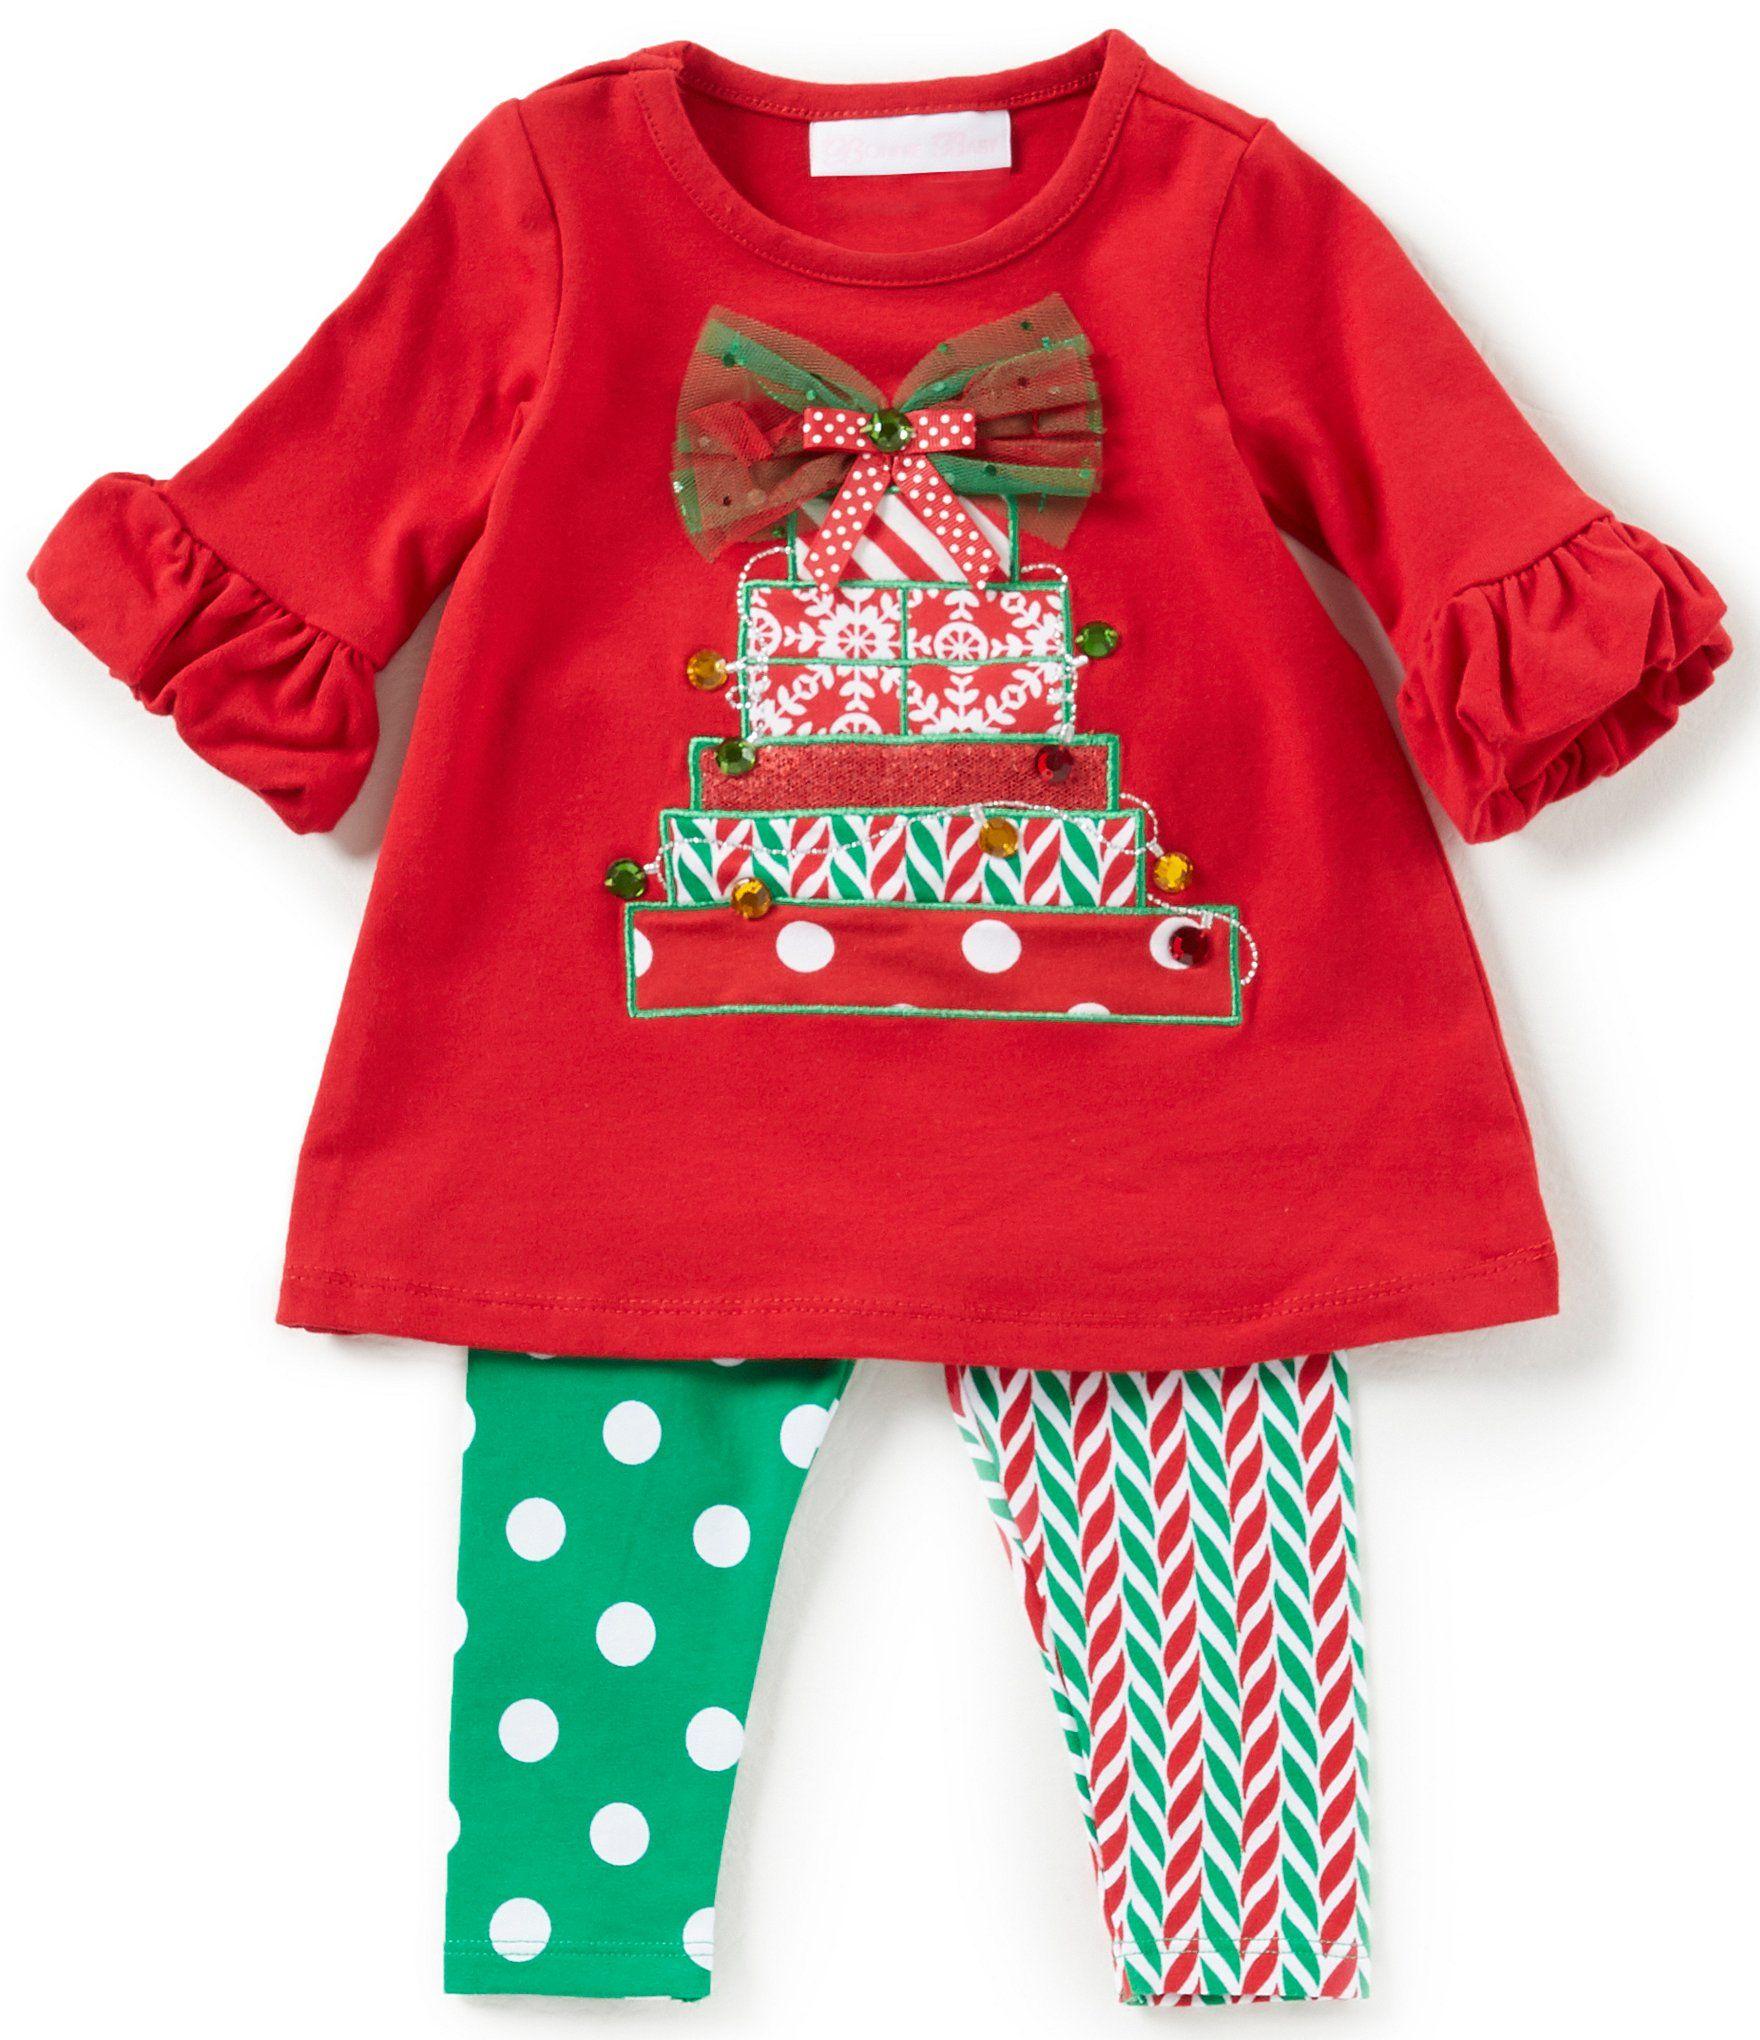 2b6187ac40de Bonnie Baby Baby Girls Newborn24 Months Christmas Present ALine Dress and  MixedMedia Leggings Set #Dillards